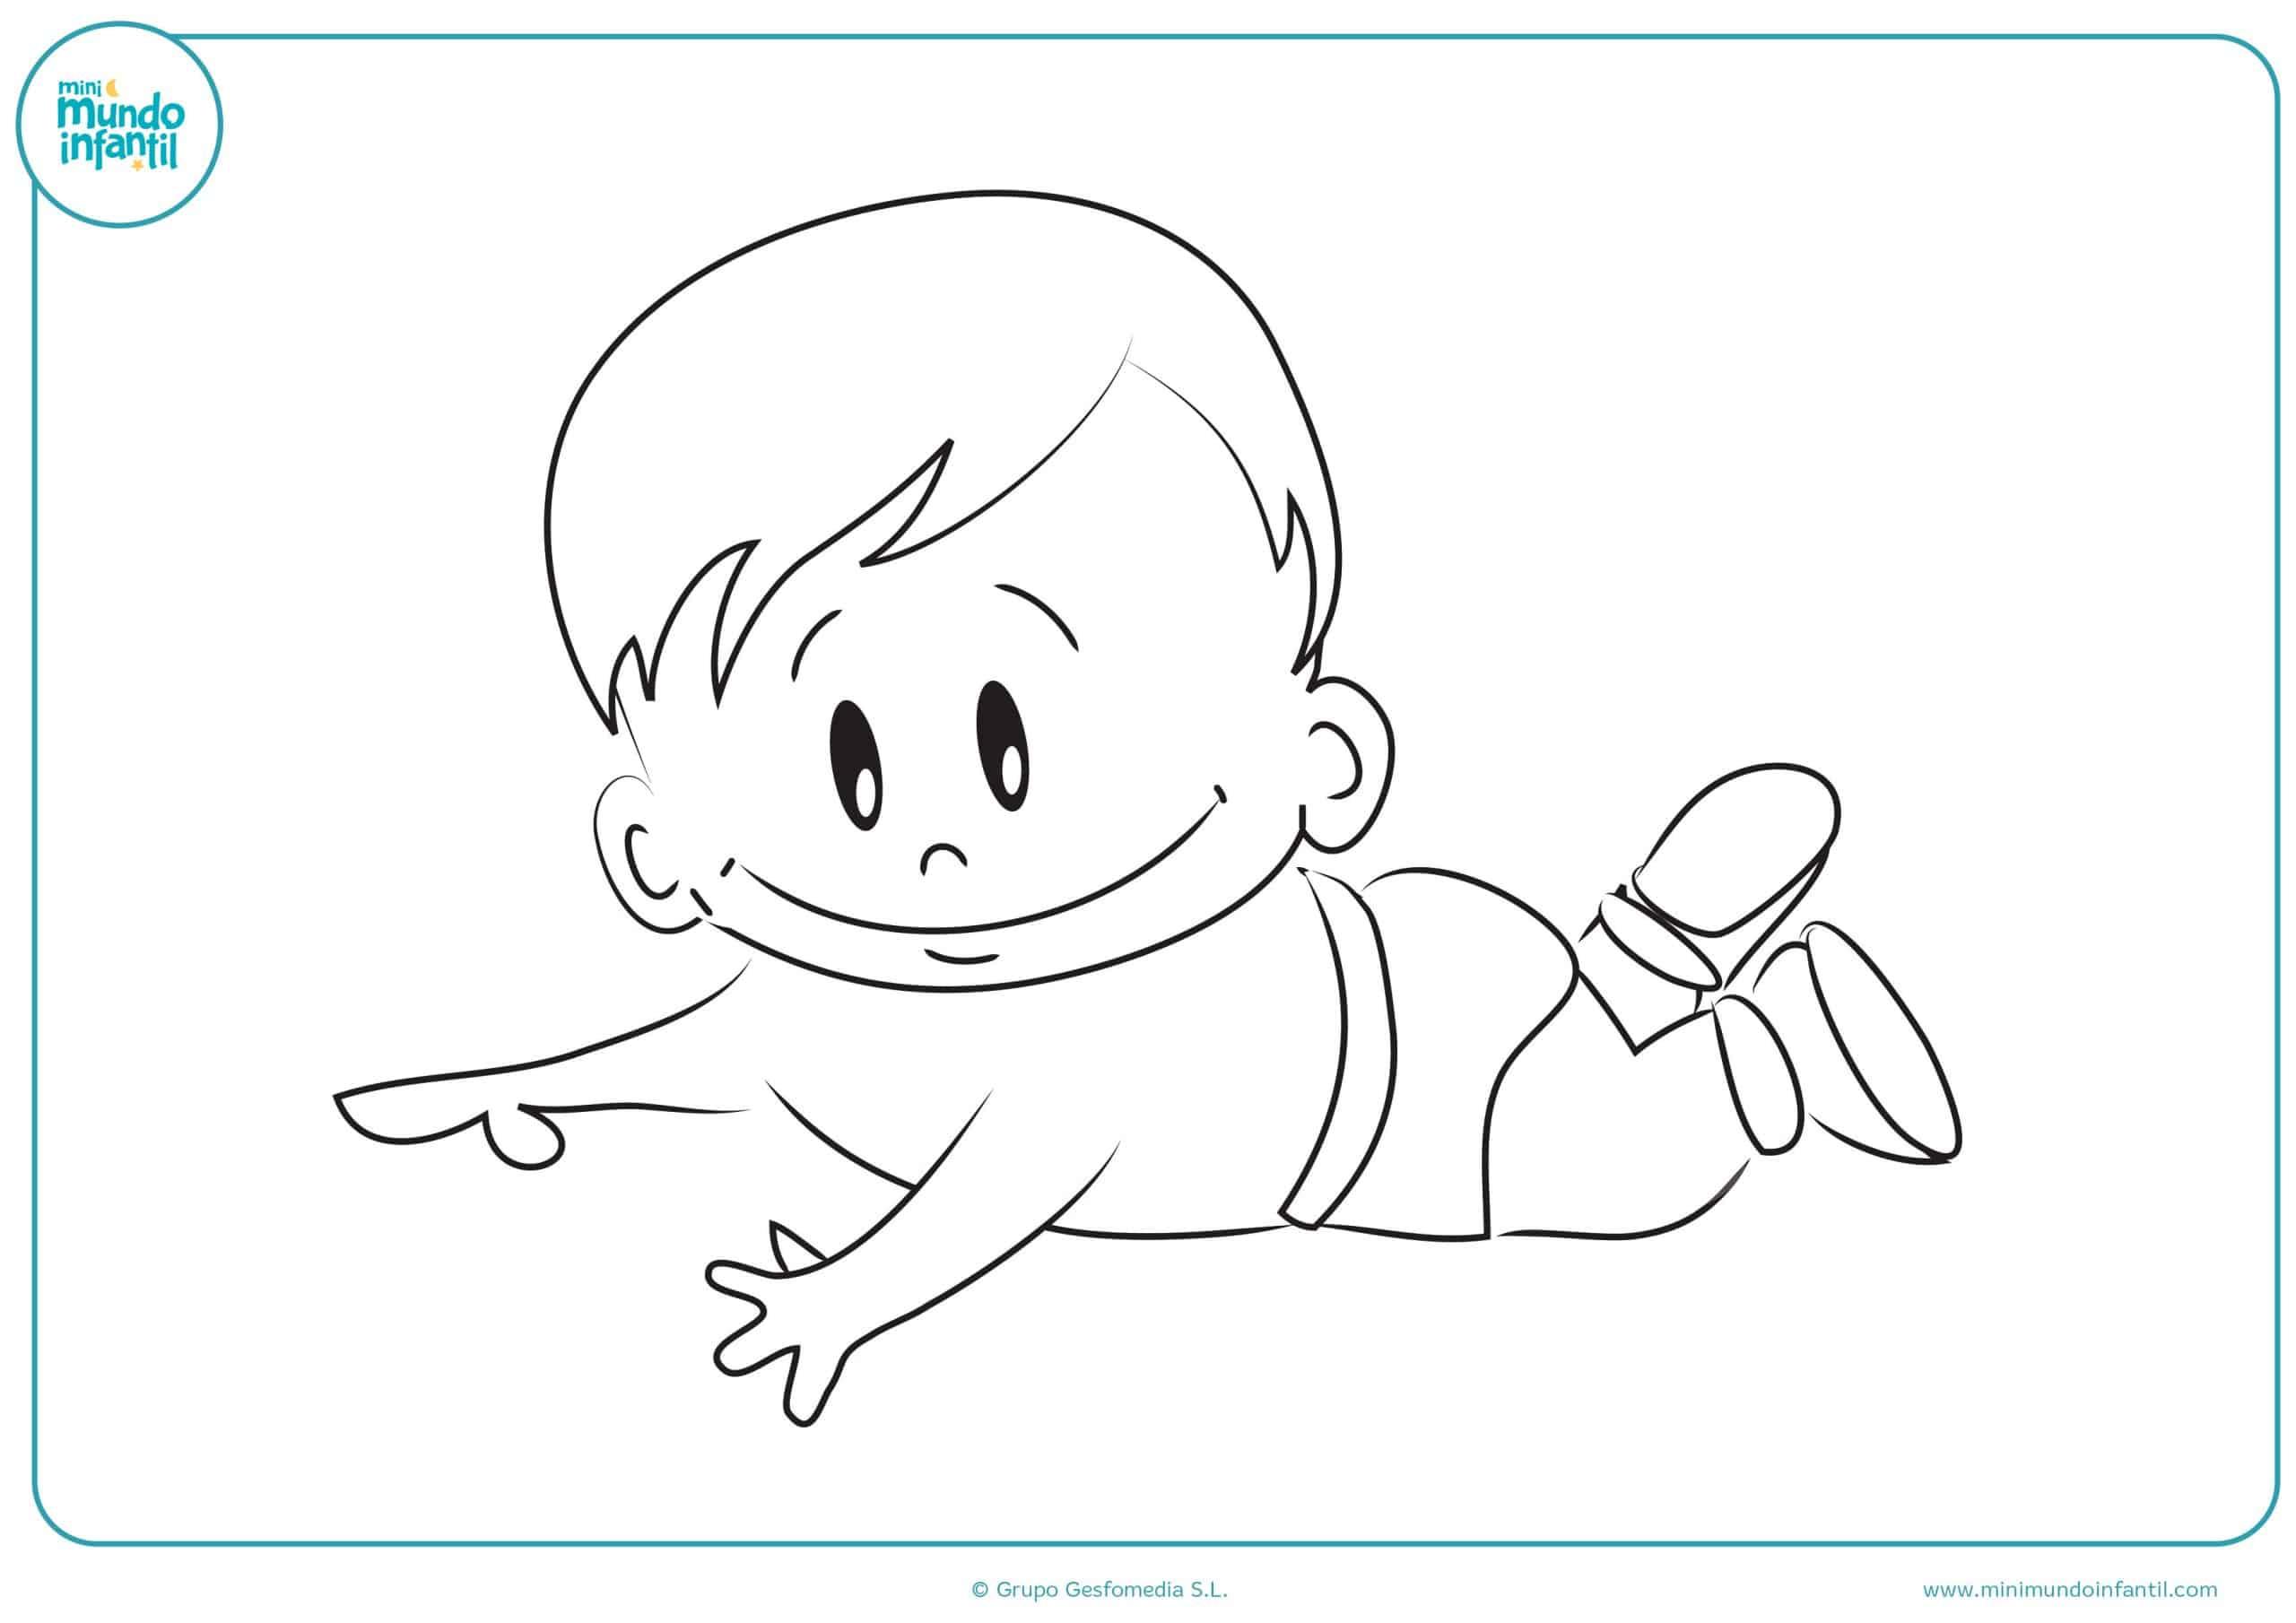 Dibujos niños niñas colorear para imprimir